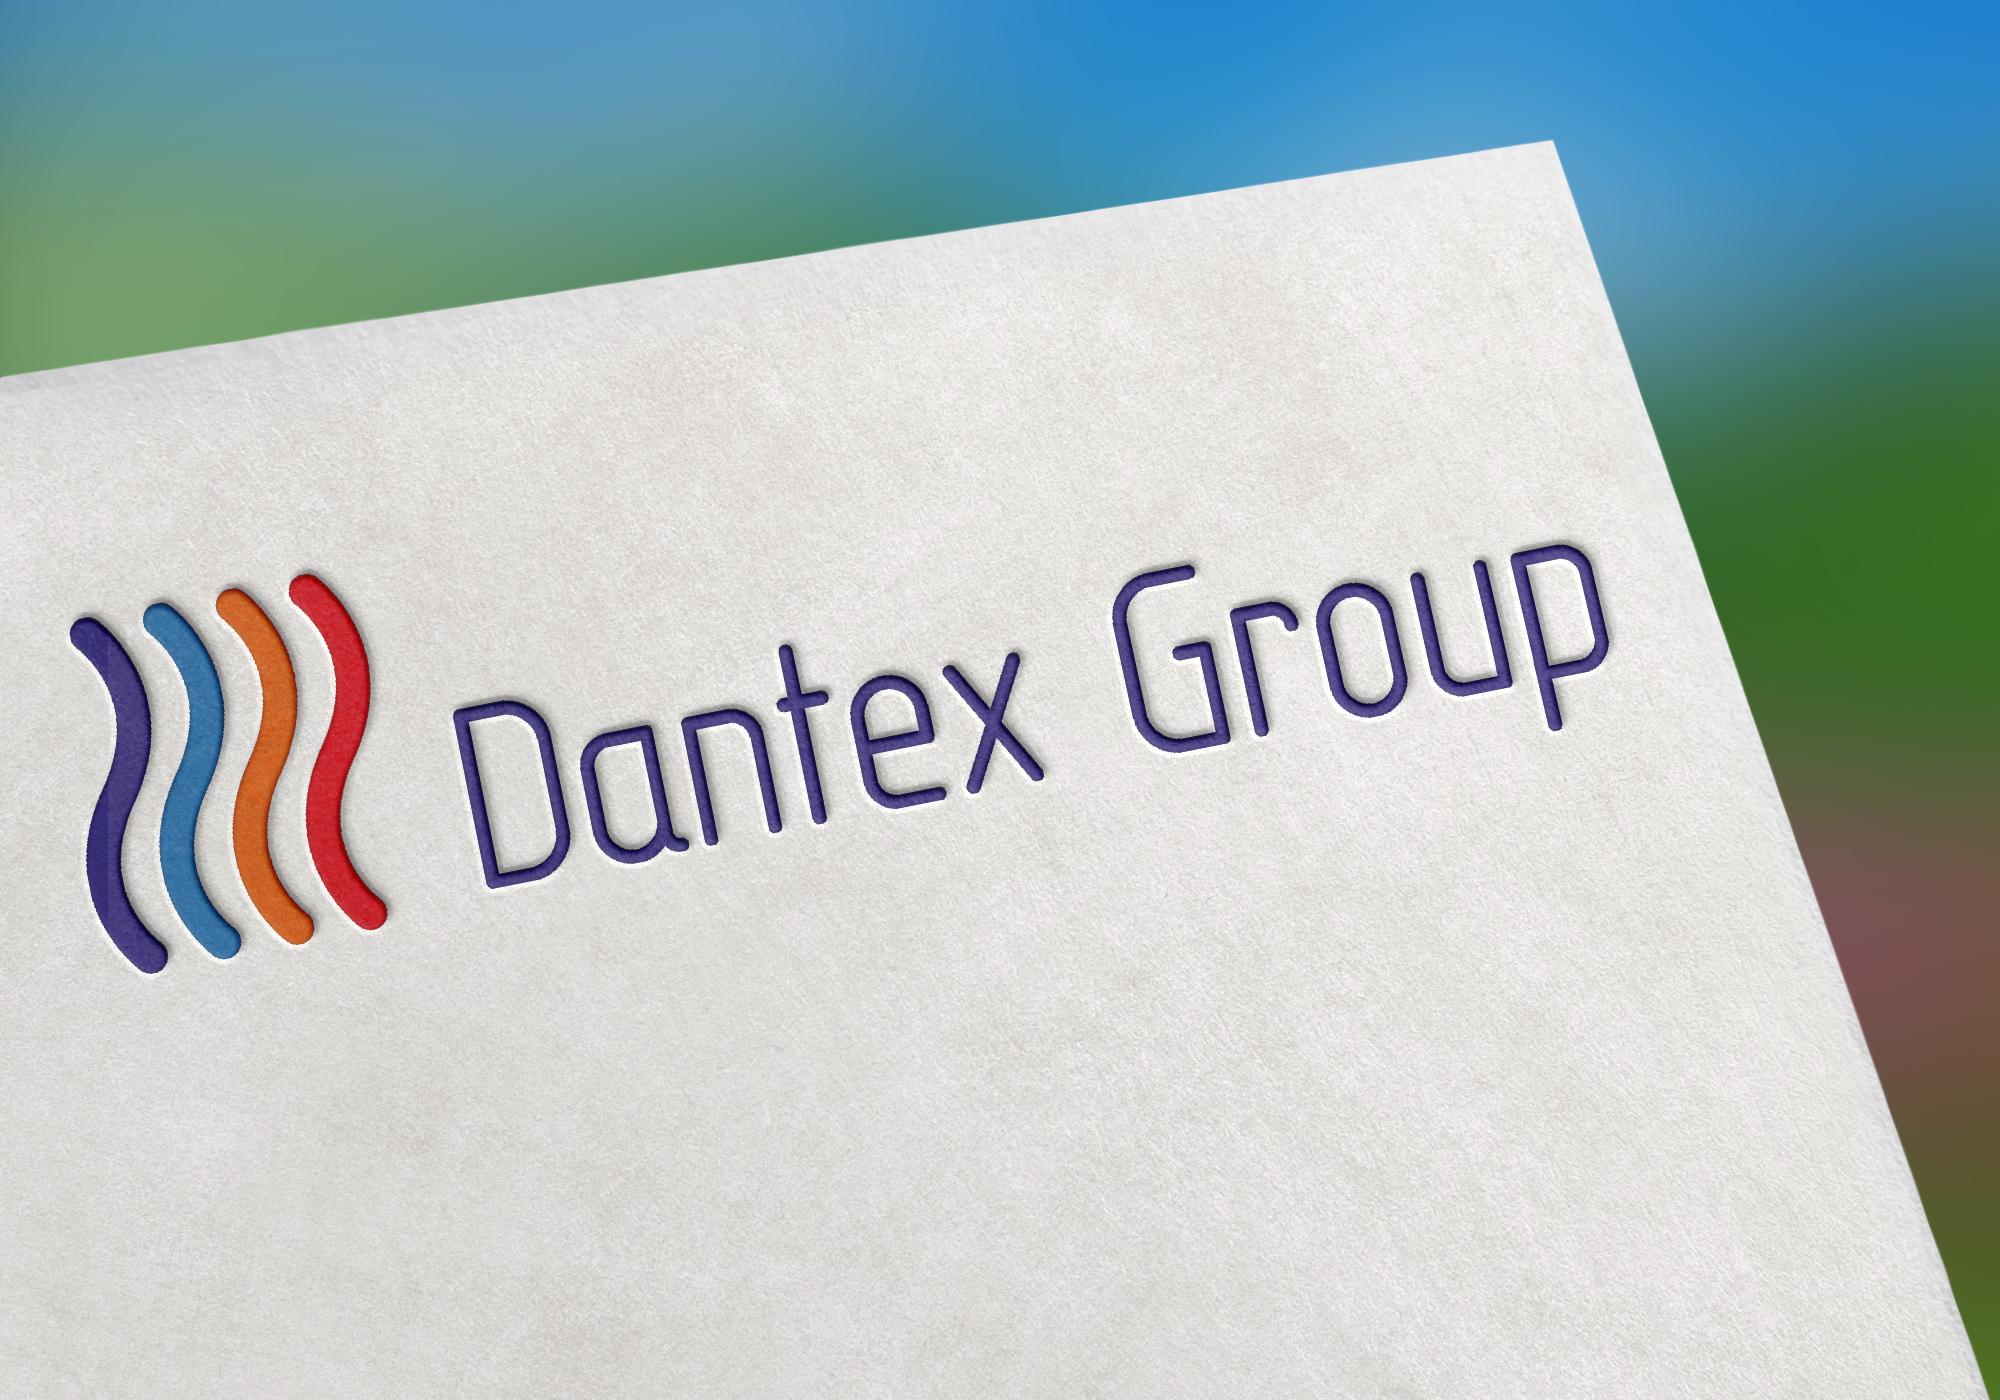 Конкурс на разработку логотипа для компании Dantex Group  фото f_8495c100828d8120.jpg